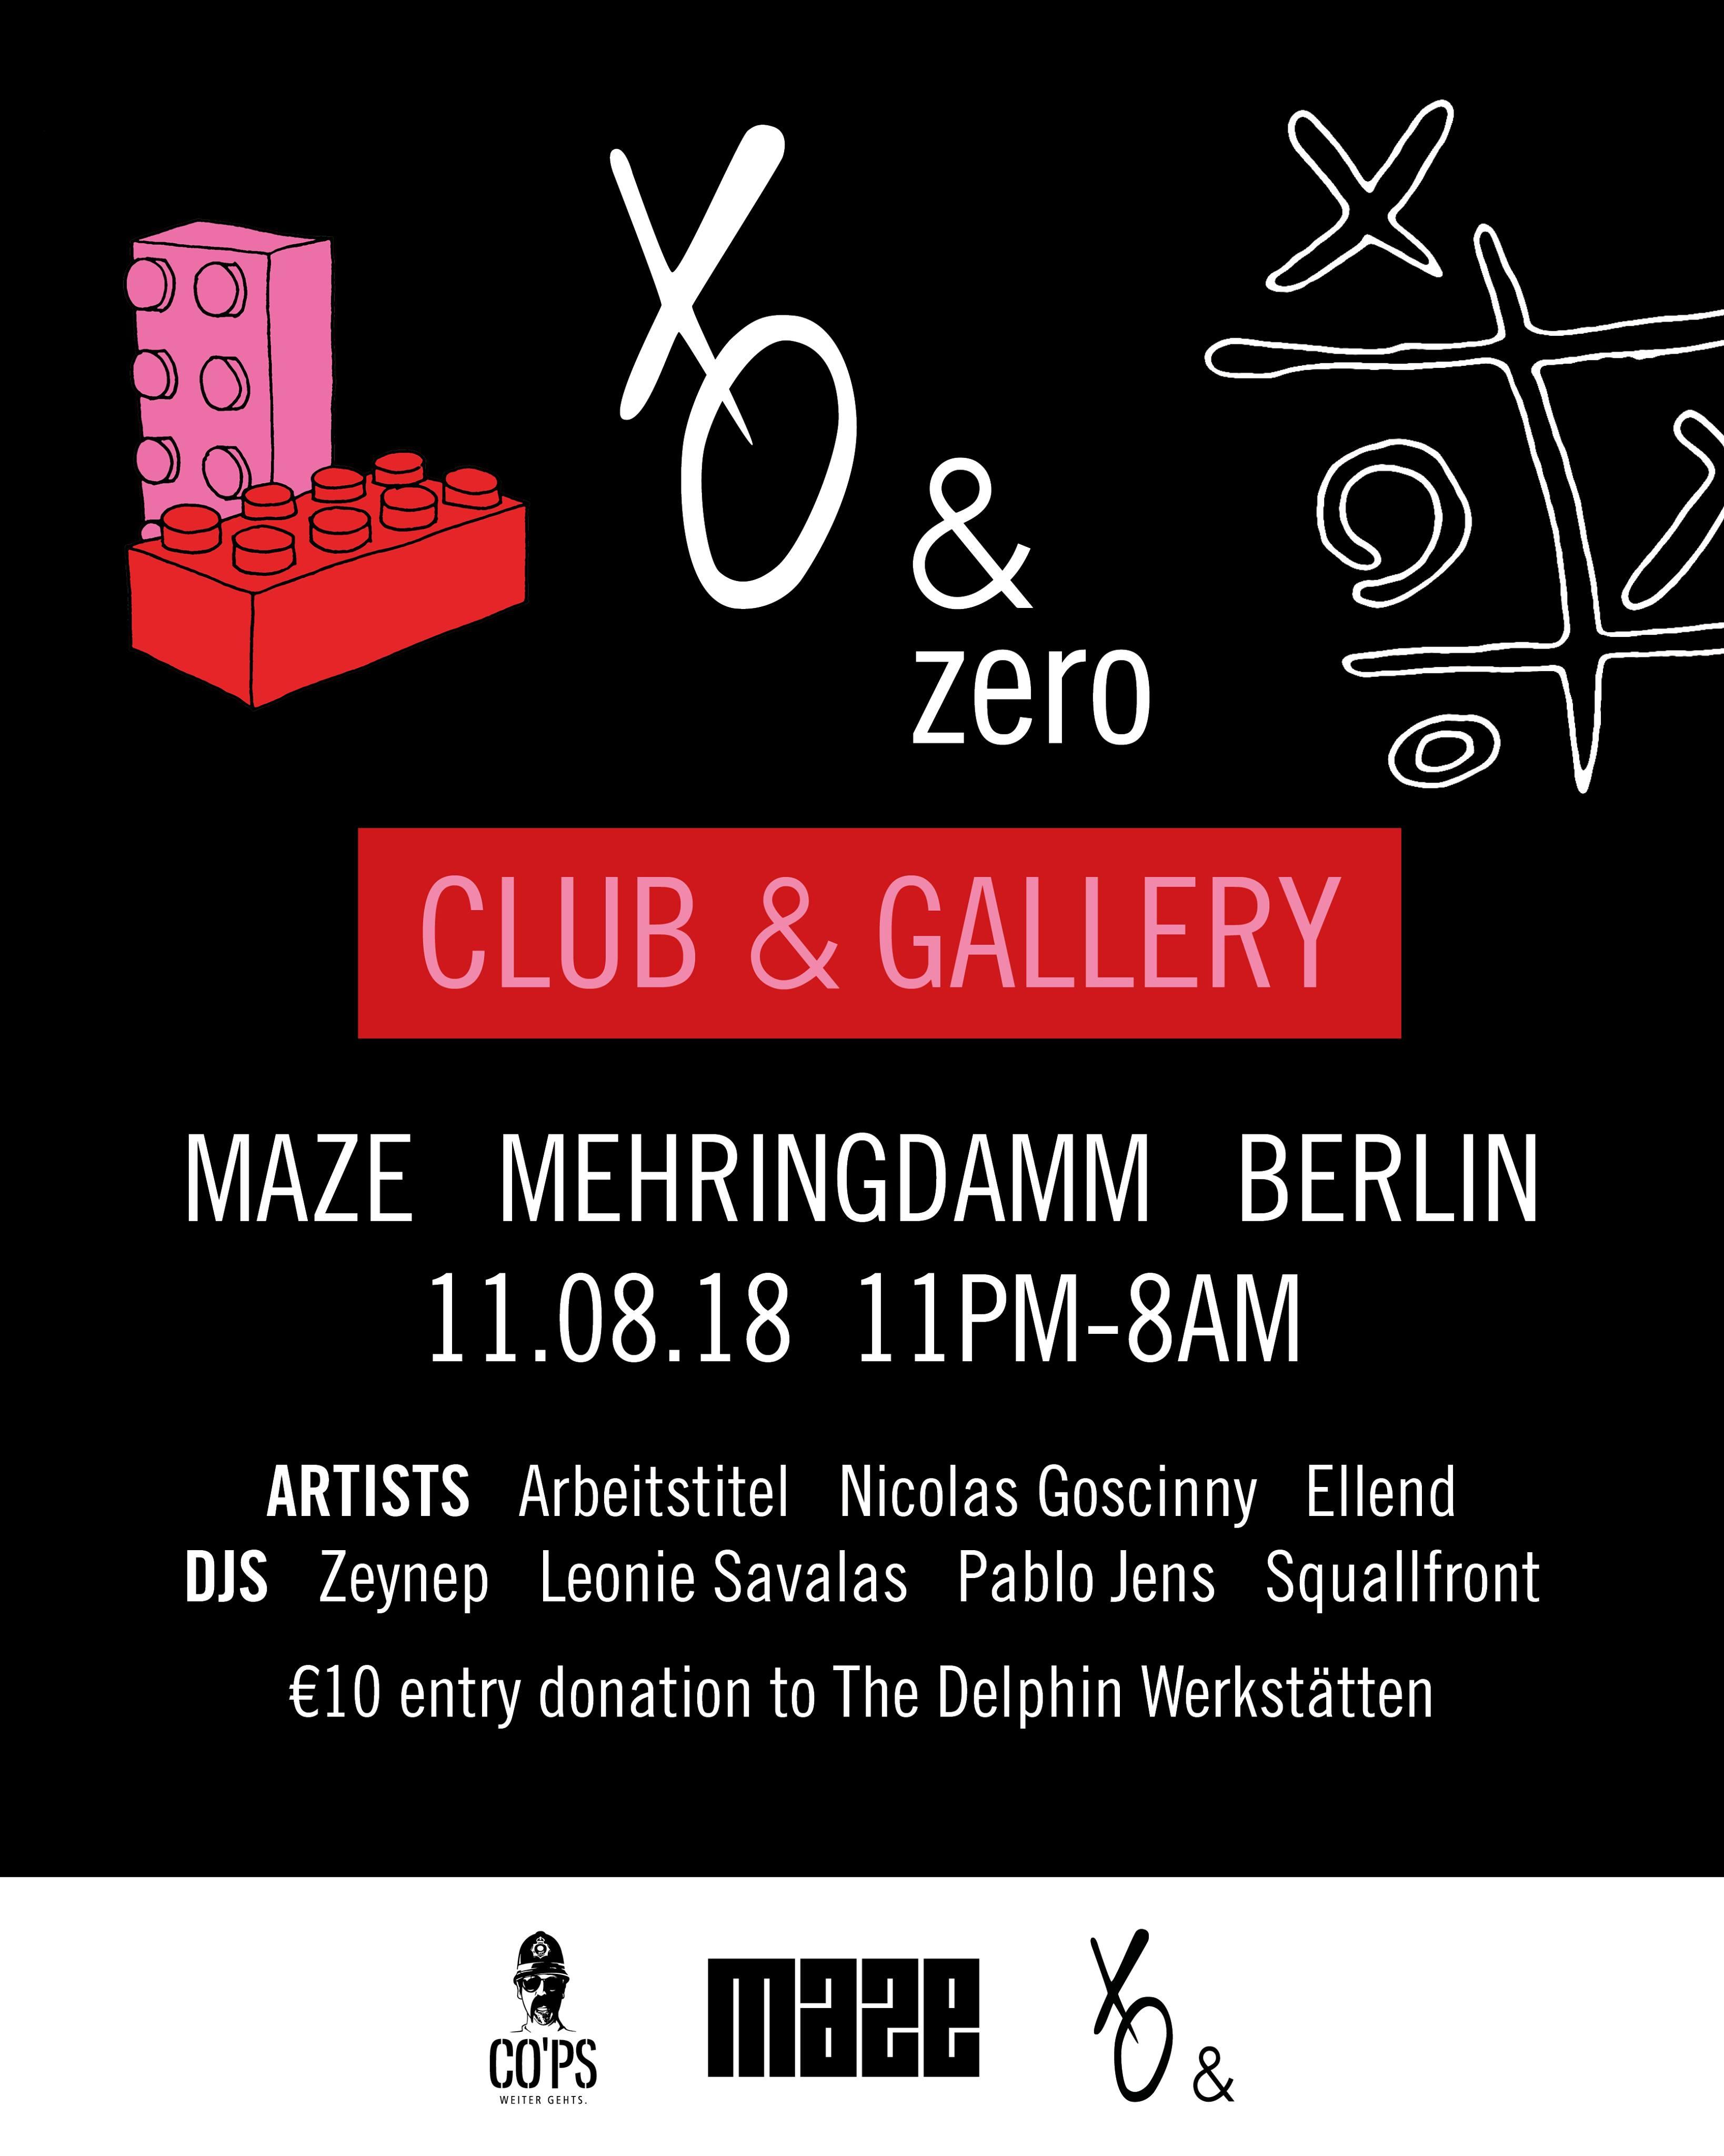 ART MEETS CLUB, CLUB MEETS CHARITY